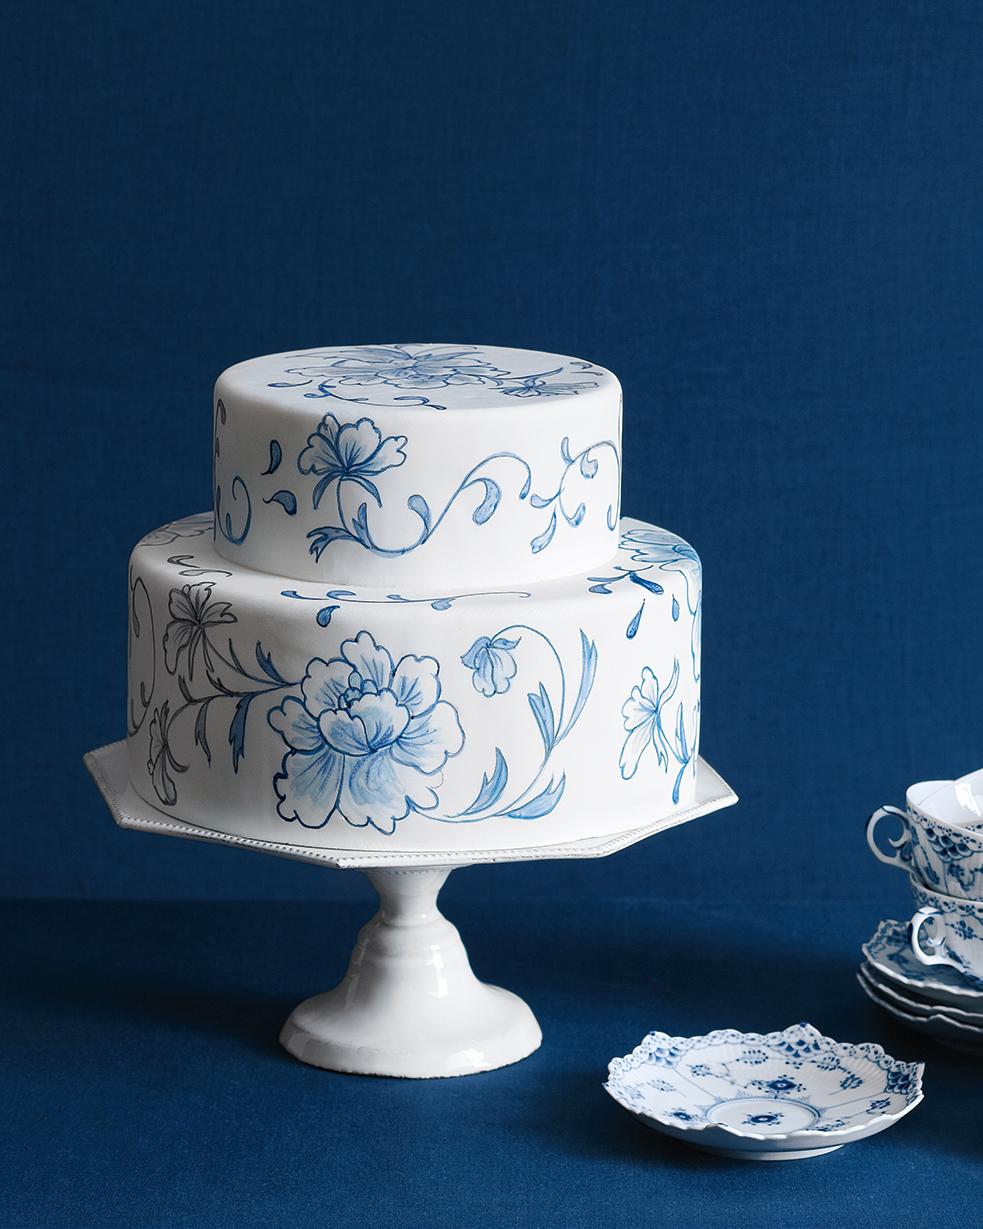 palette-blue-cake-mwd108489.jpg